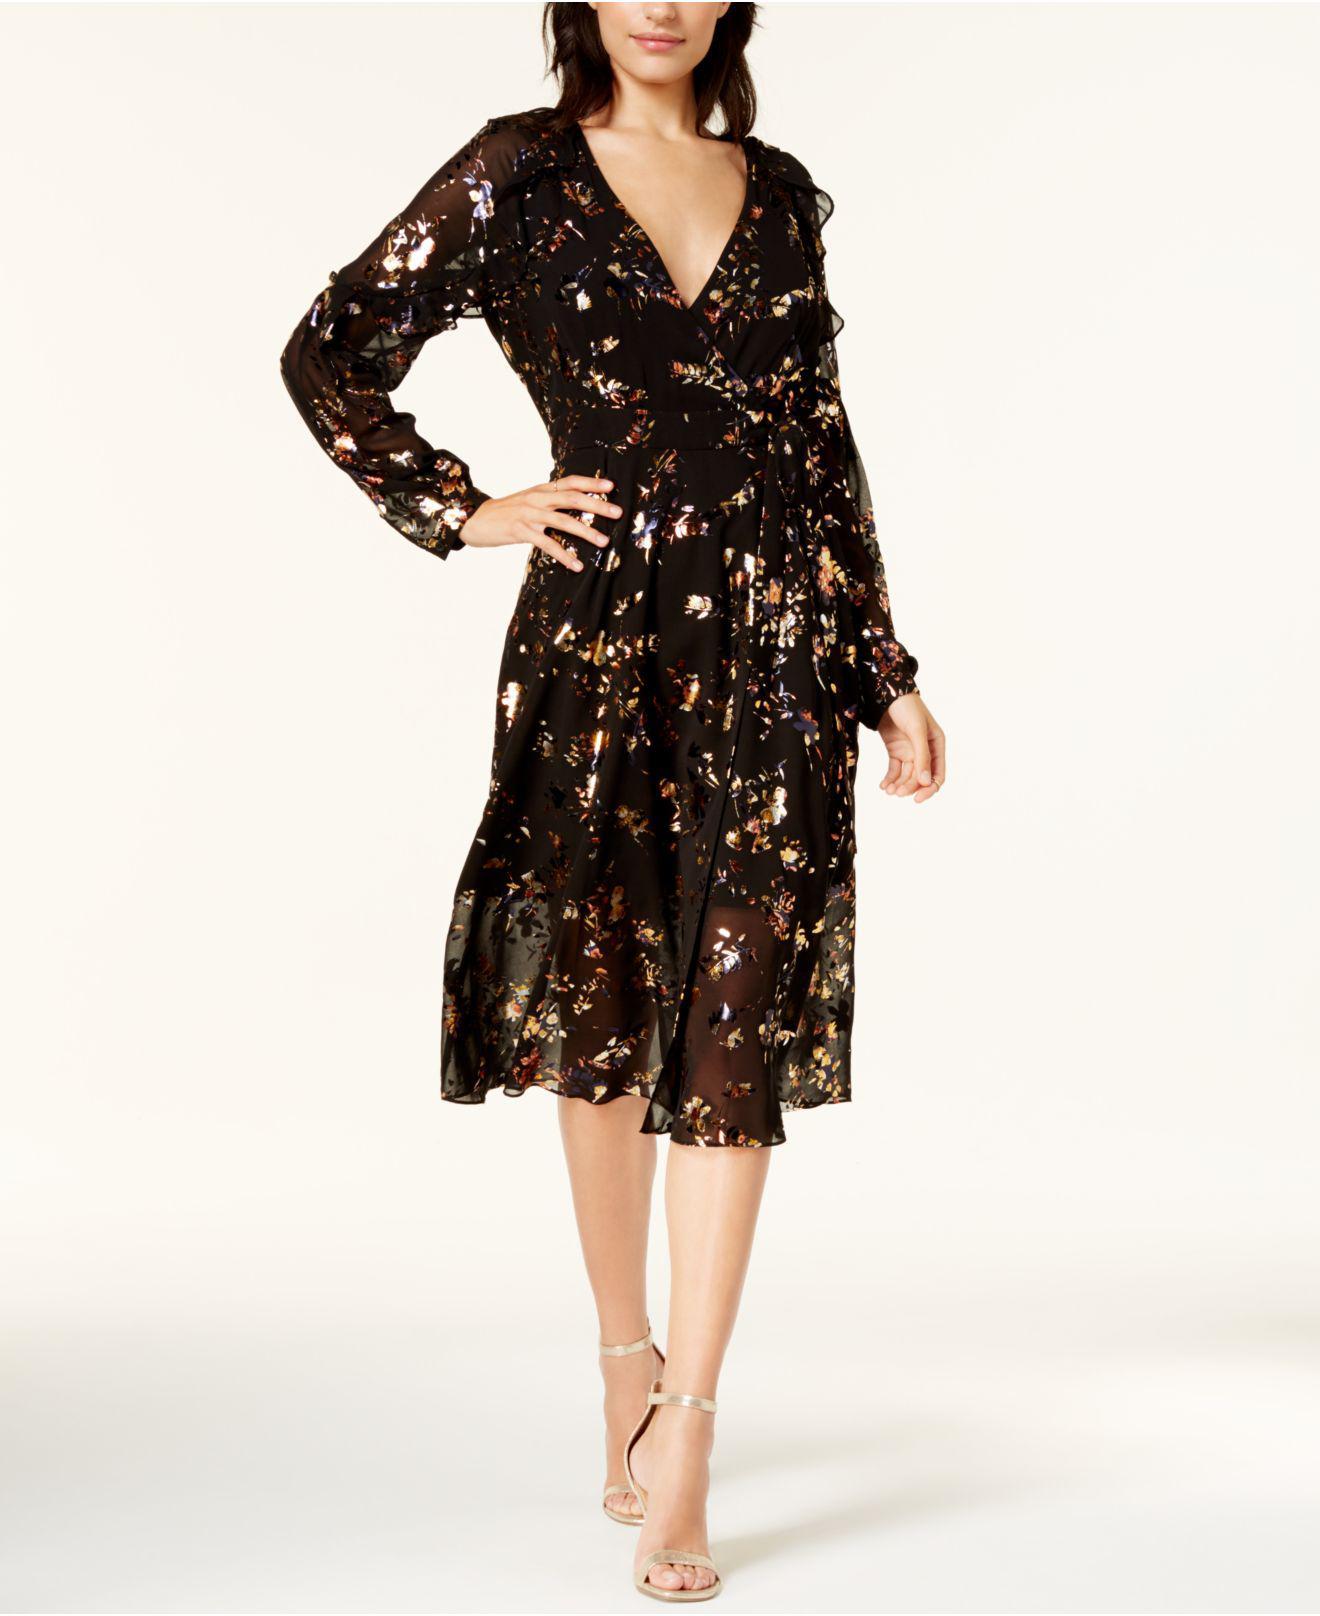 c2f2974d5823f Lyst - RACHEL Rachel Roy Printed Mesh Wrap Dress in Black